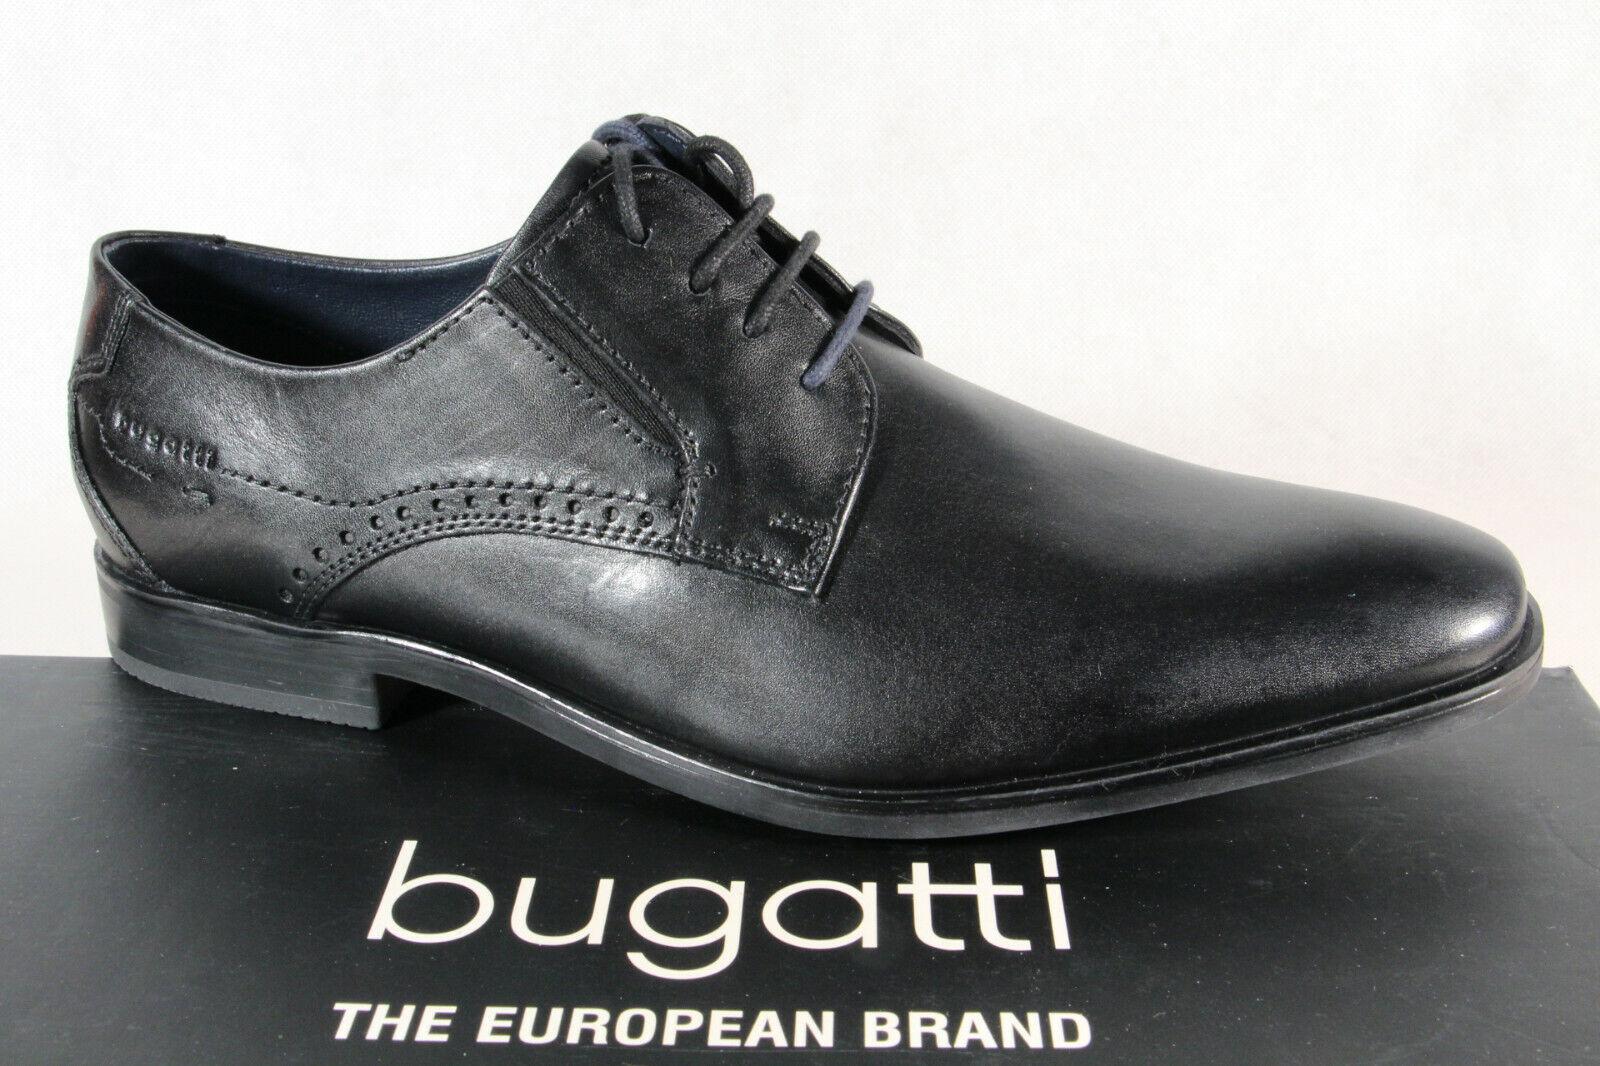 Bugatti Herren Schnürschuh Schnürschuhe Halbschuhe Sneaker schwarz R0208 NEU!